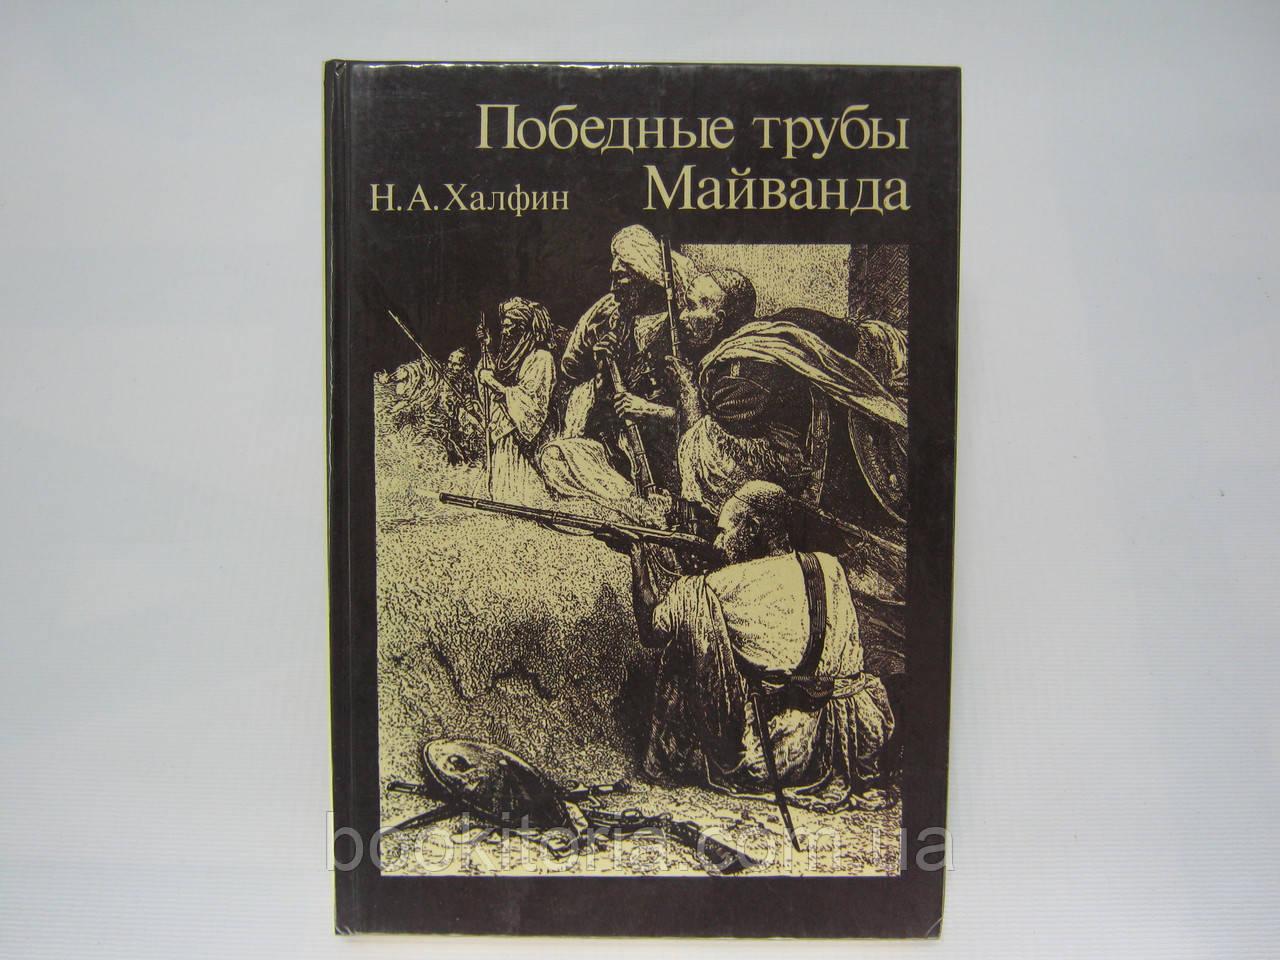 Халфин Н.А. Победные трубы Майванда (б/у).